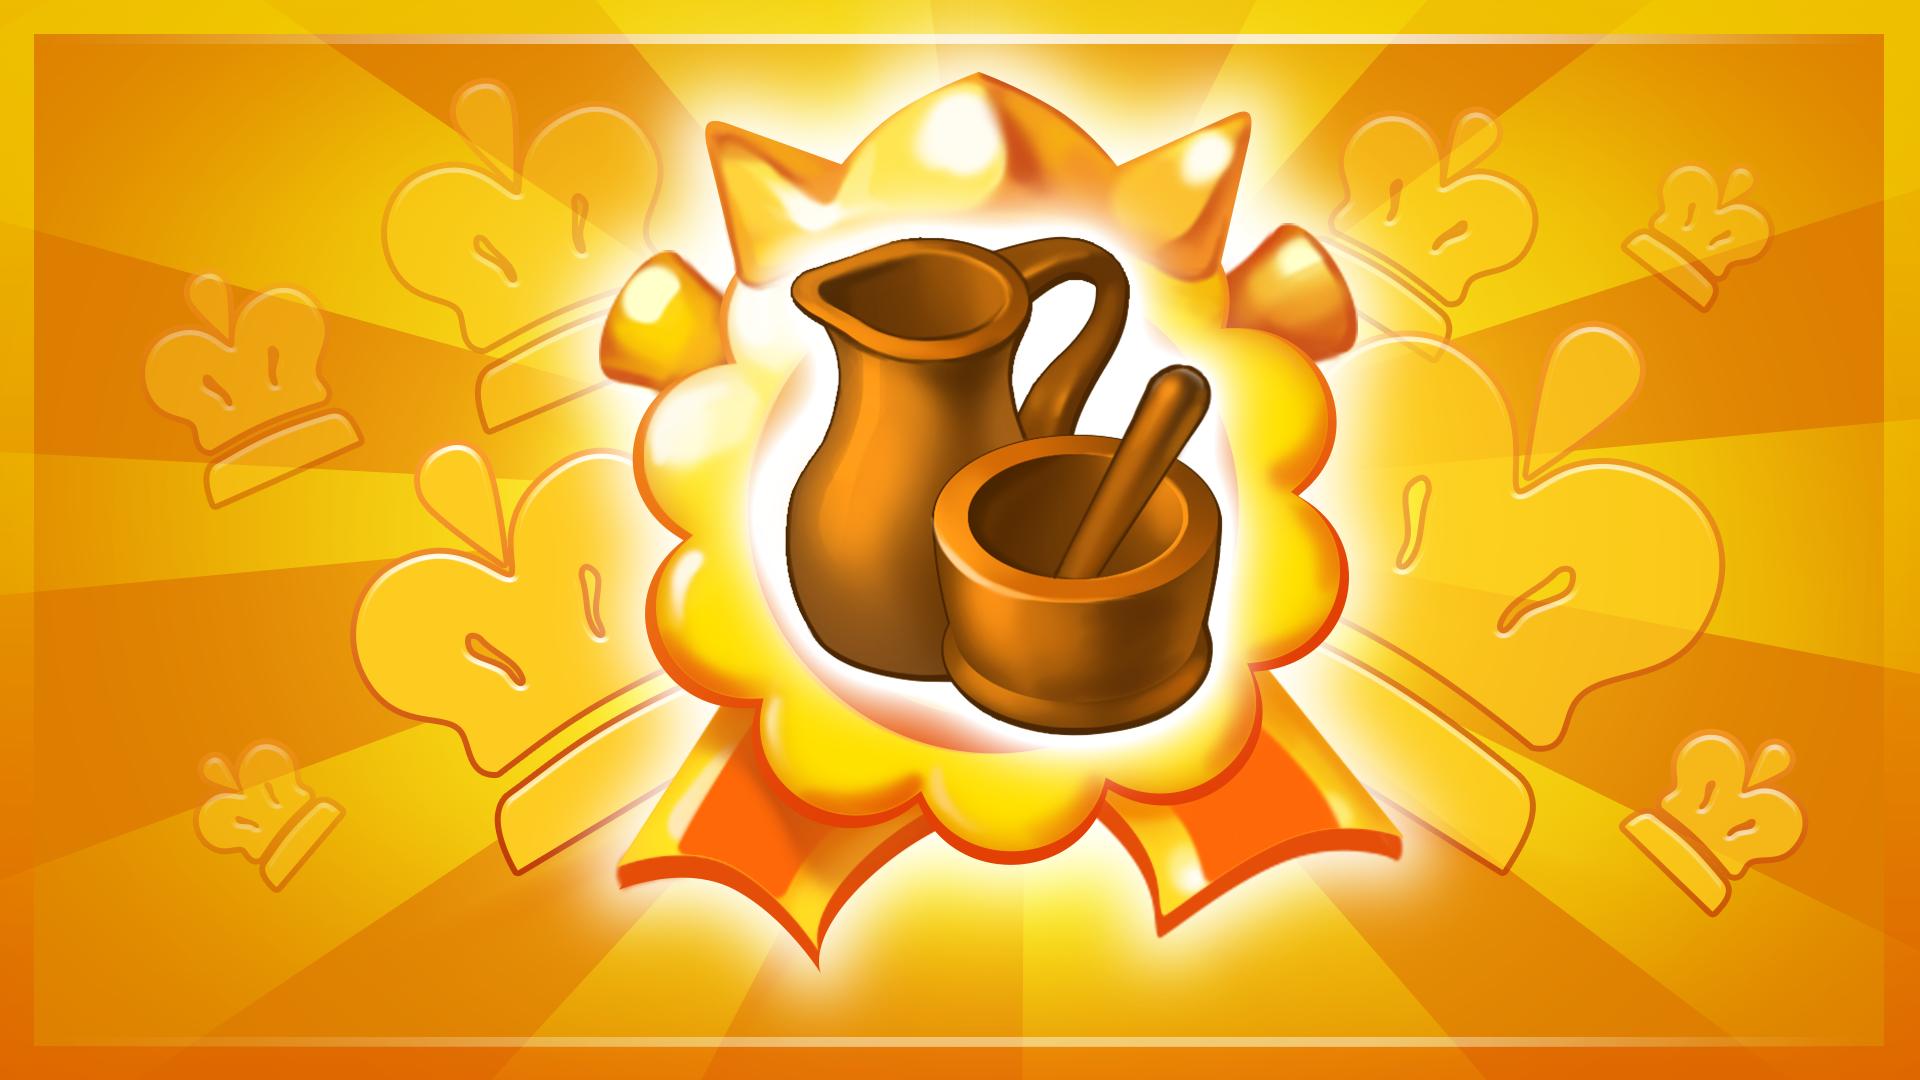 Icon for Porcelain Shop 3